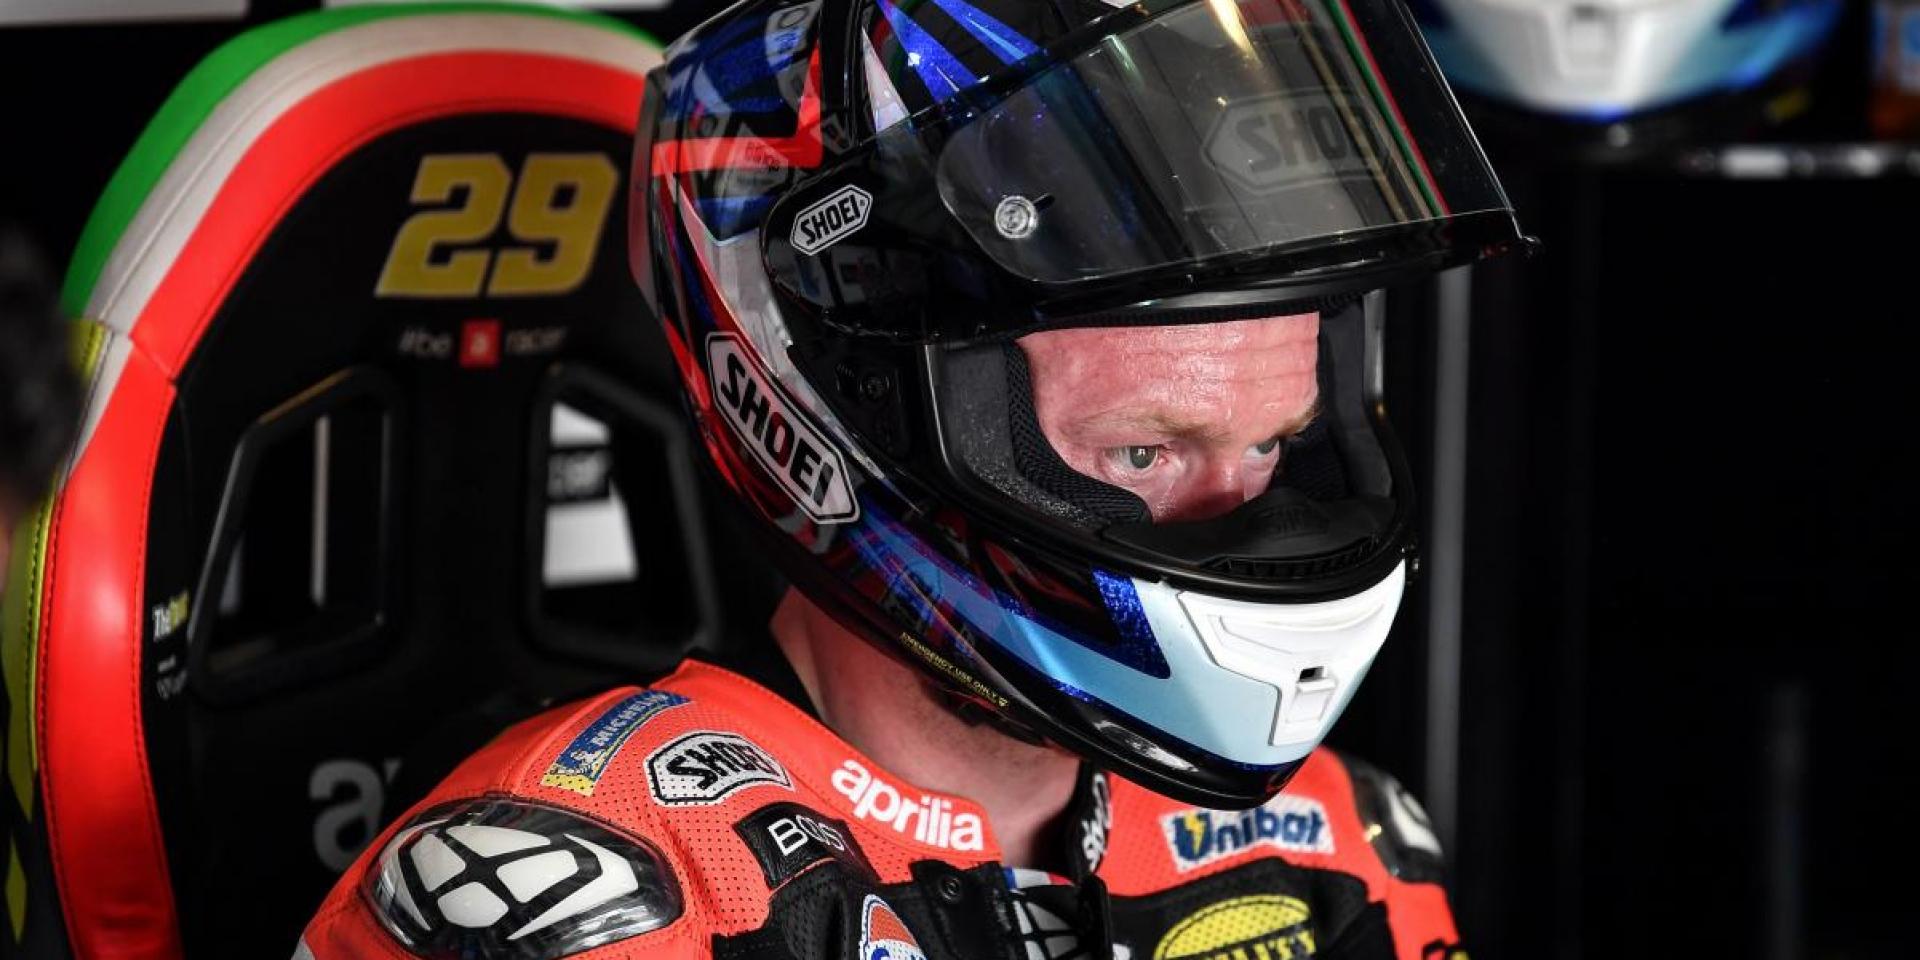 Bradley Smith:在APRILIA車隊裡,大家都知道我比Lorenzo Savadori要更快!